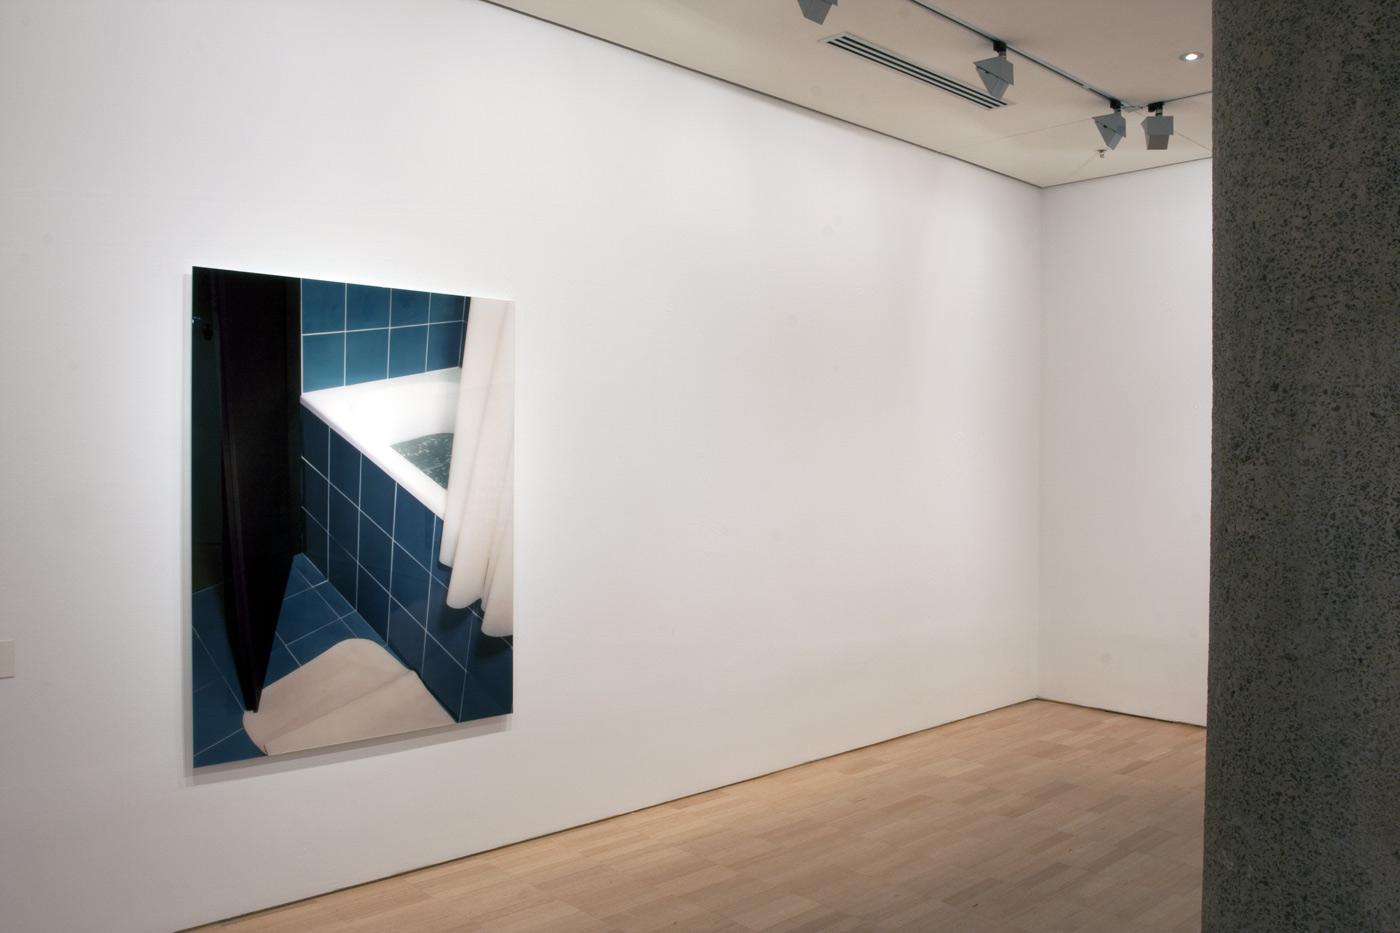 Thomas Demand Badezimmer / Bathroom | Art Blart